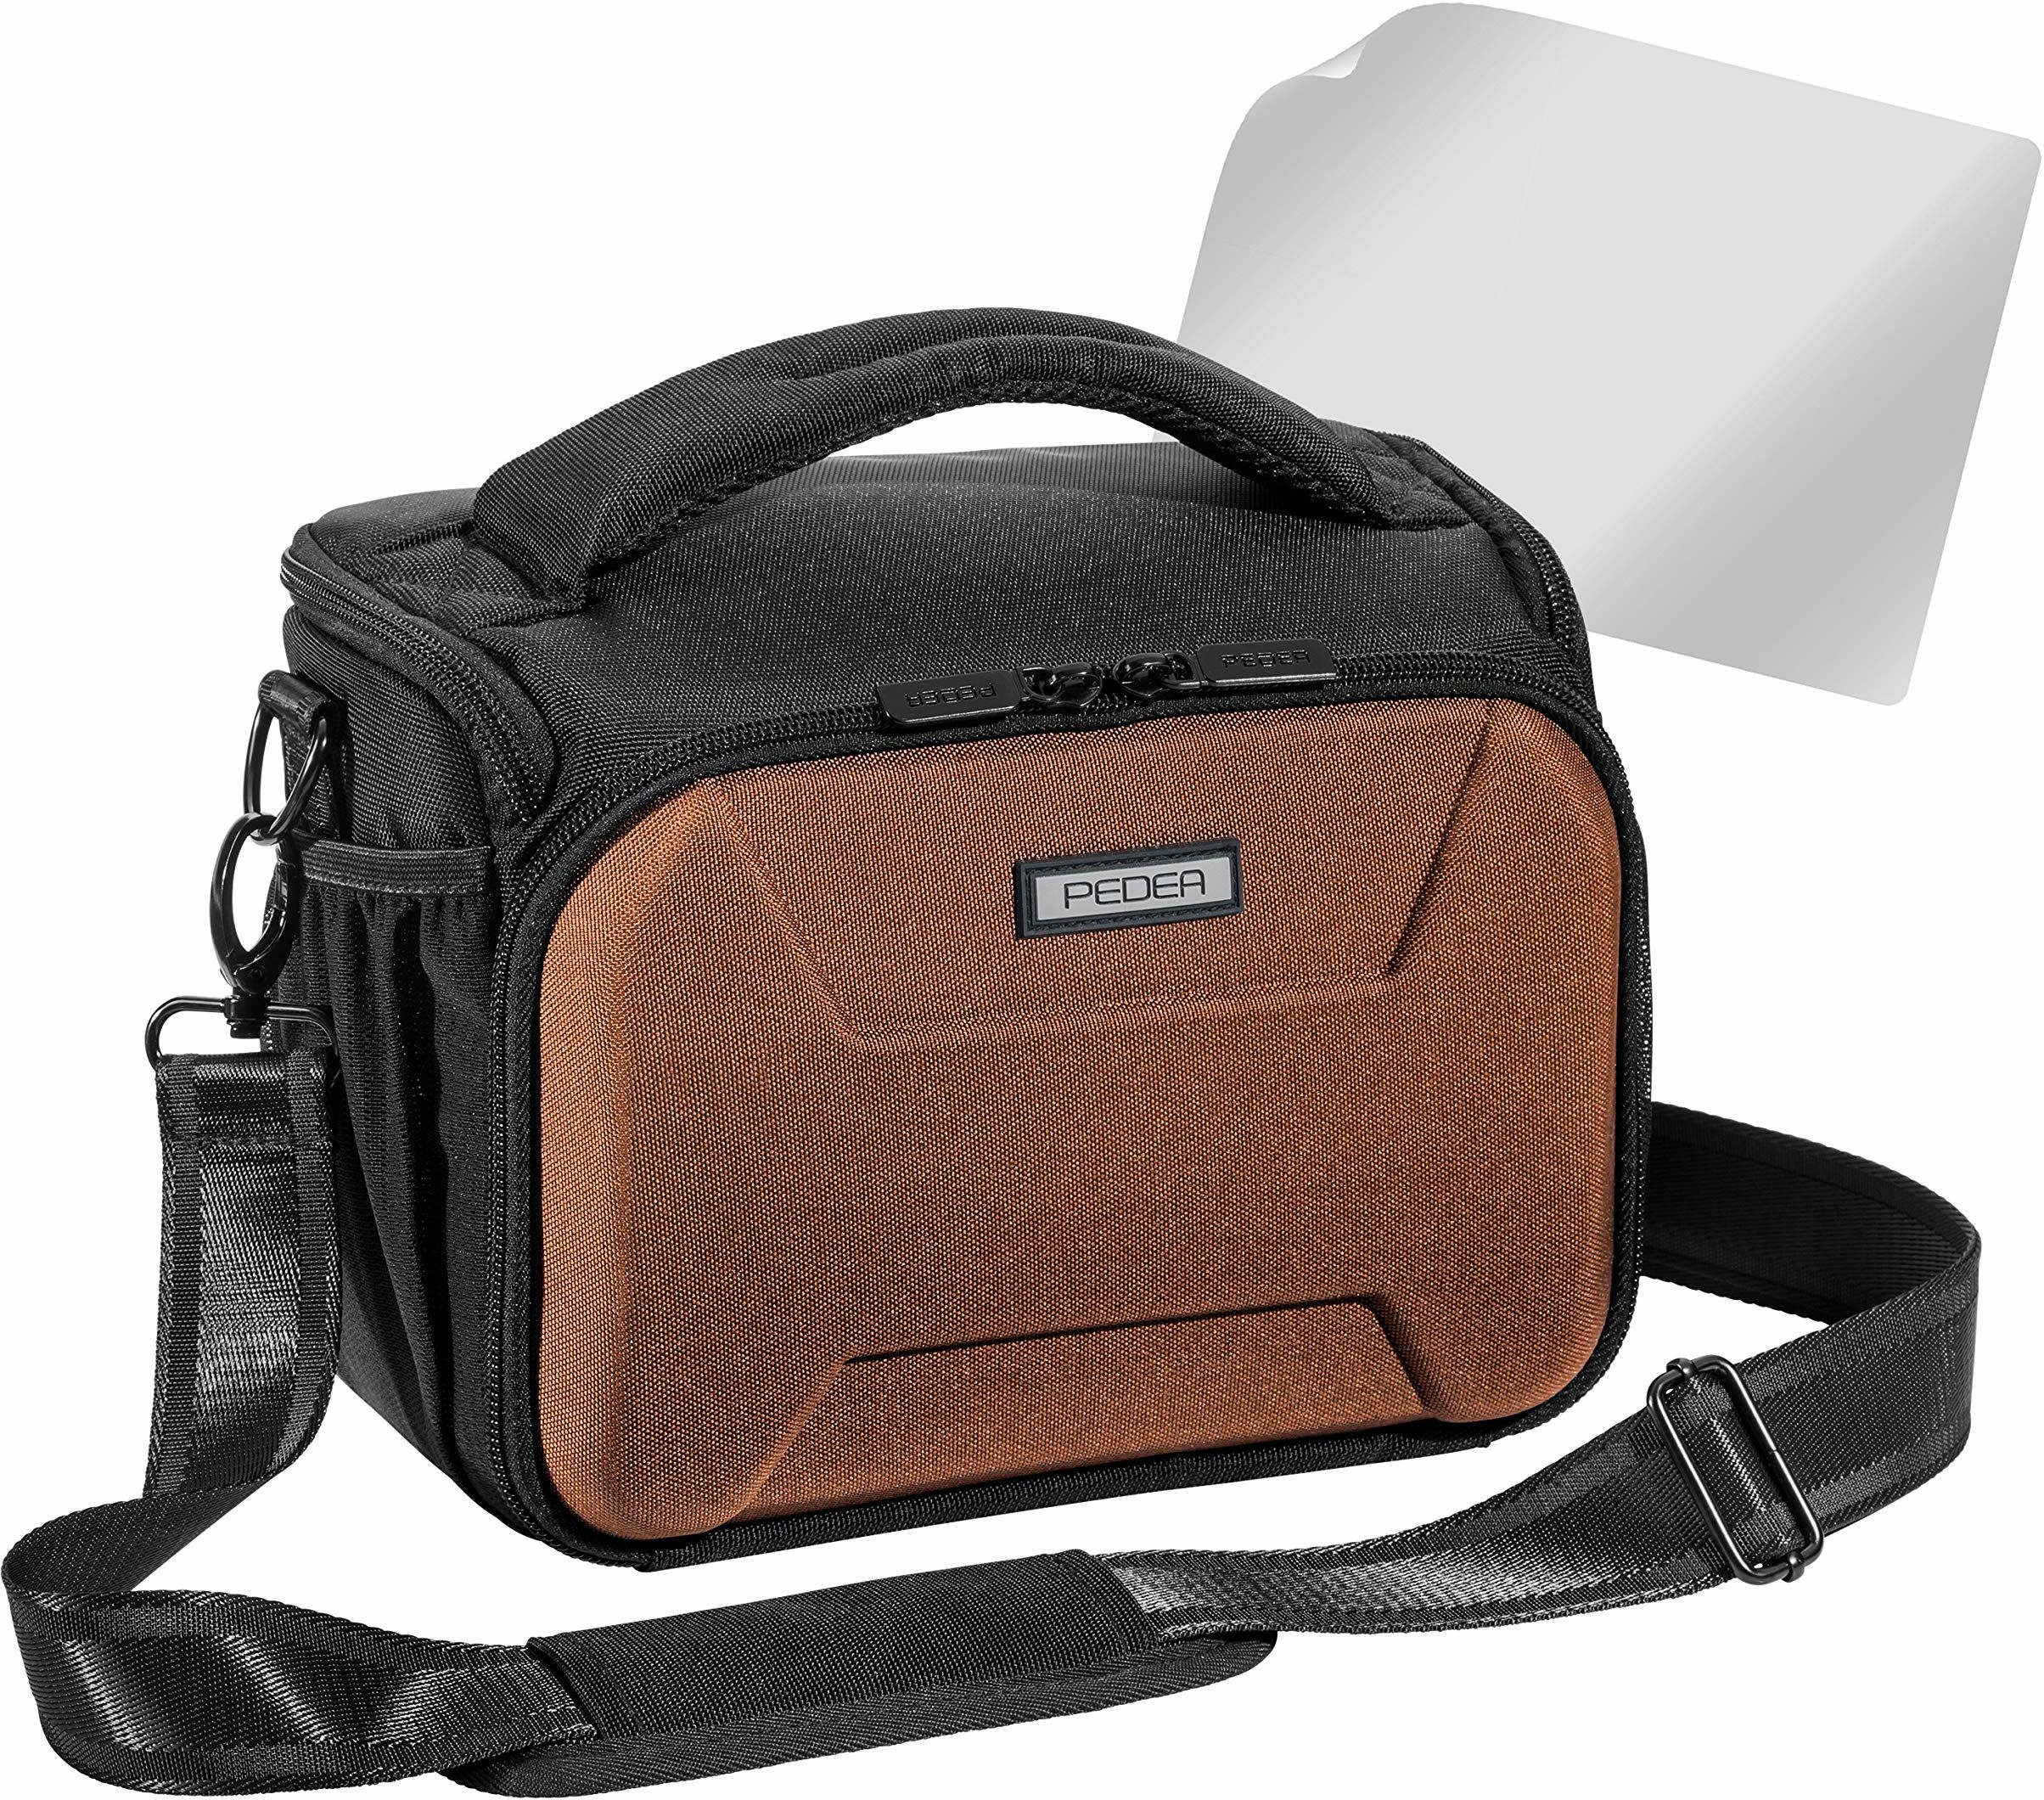 "PEDEA DSLR torba na aparat""Guard"" z folią ochronną na wyświetlacz do Nikon D500 D750 D3500 D5200 D300 Coolpix B500 / Sony Alpha 7 7M2 7M3 7R II DSC-RX10 / Canon EOS 77D 200D 130D 0D, rozm. XL brązowy"